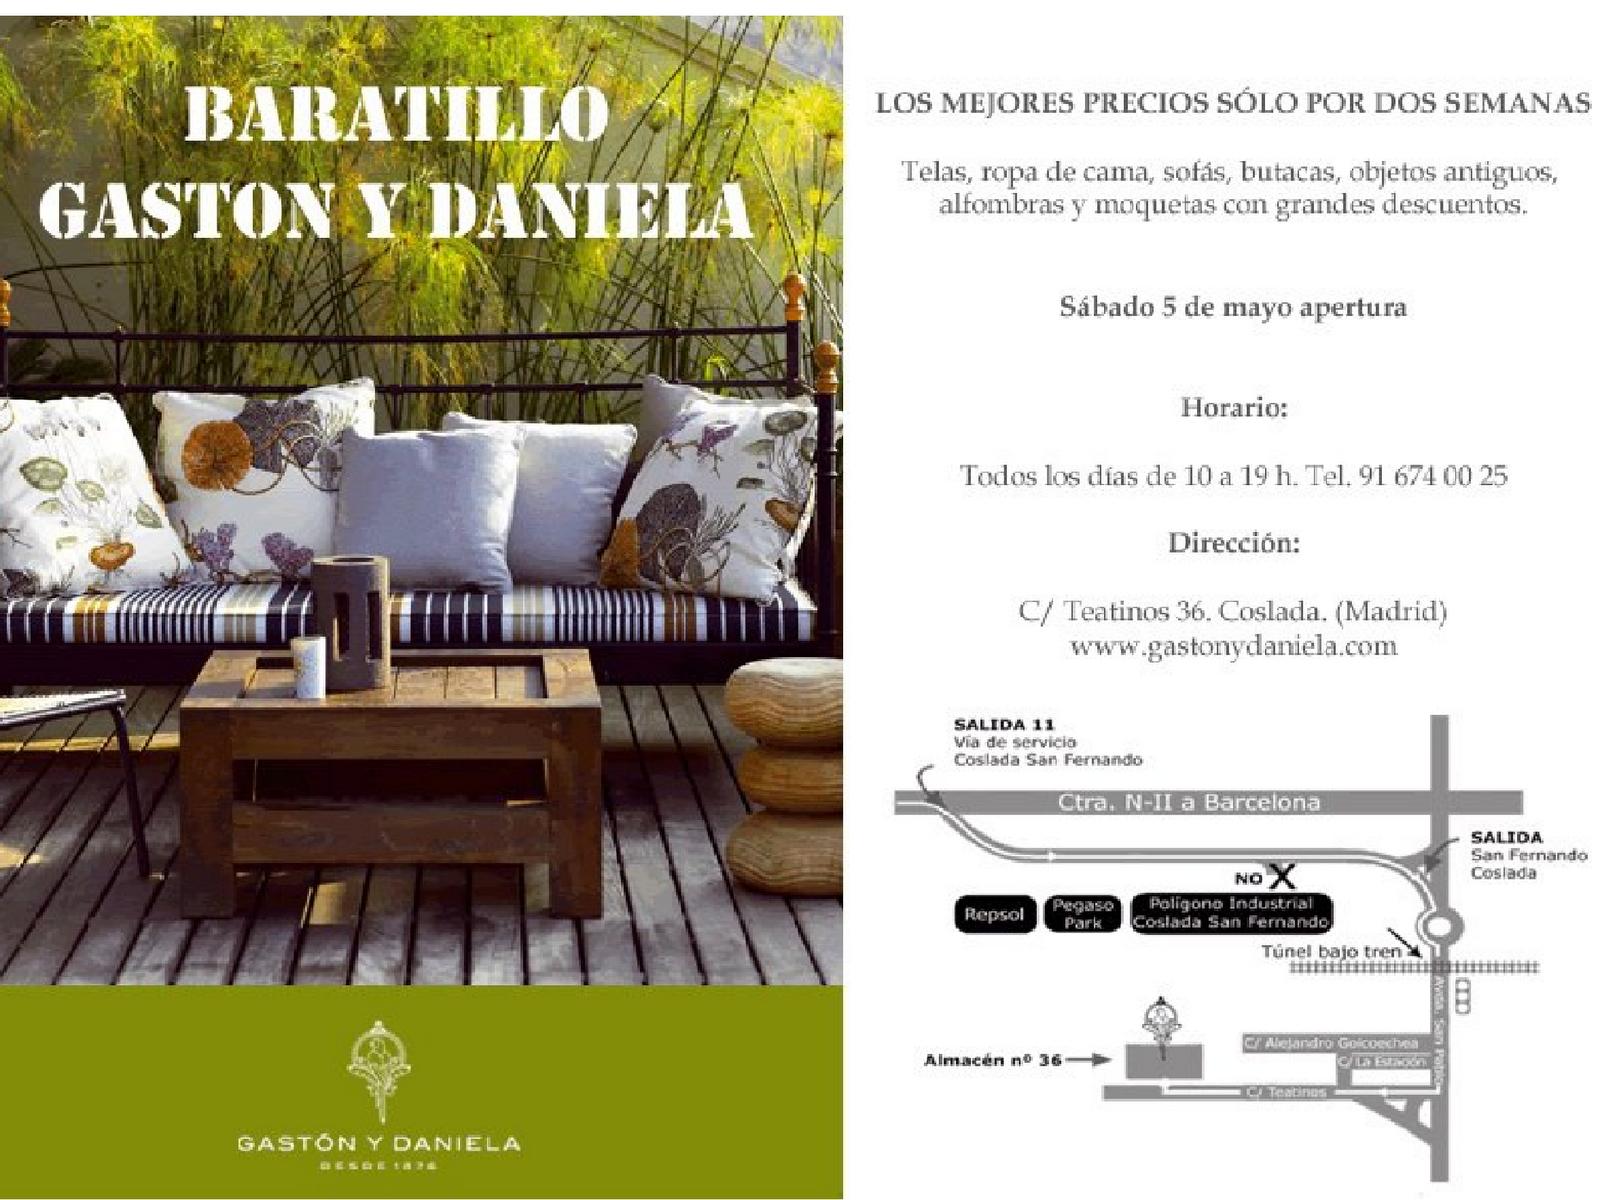 Baratillo gast n y daniela 2012 divinopresente - Gaston y daniela coslada ...